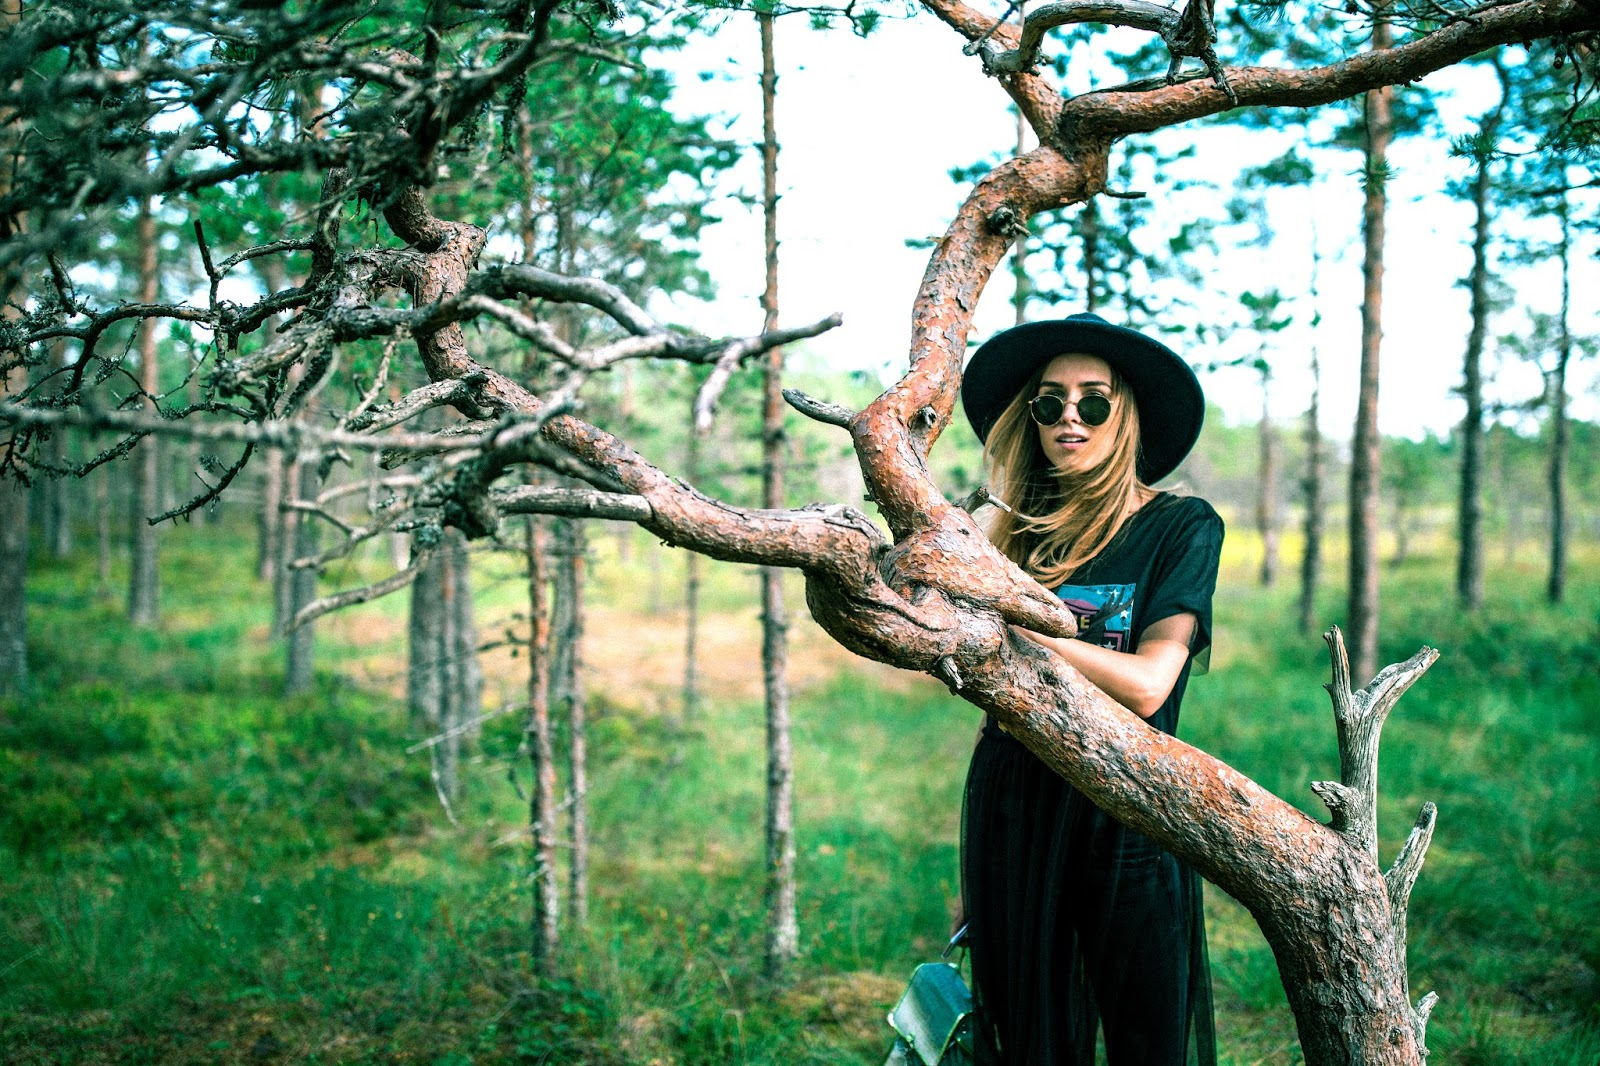 black felt fedora round sunglasses band tee outfit